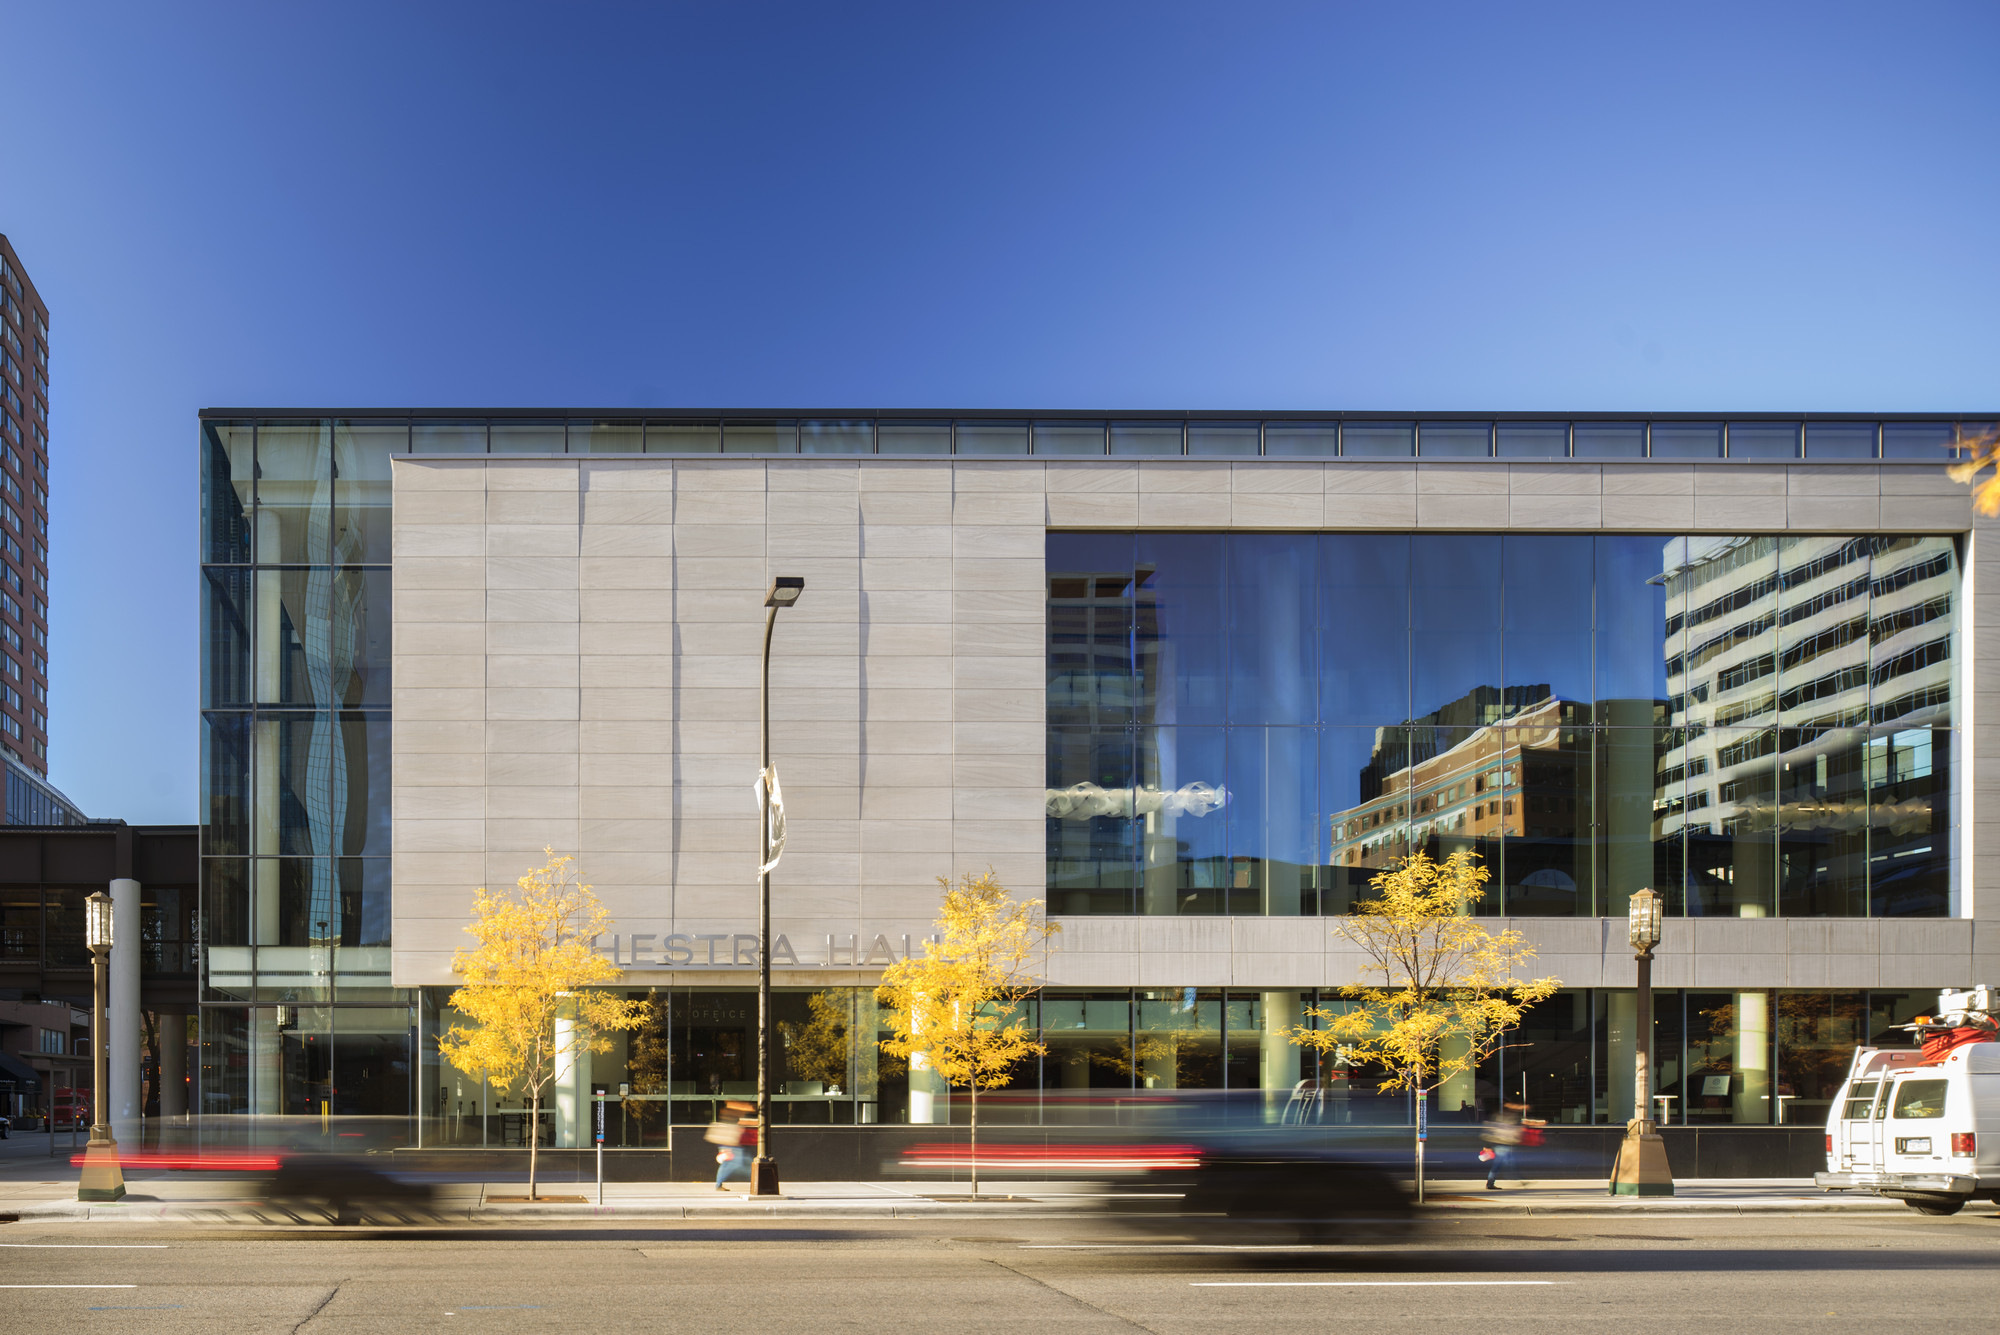 Minnesota >> Gallery of Minnesota Orchestra Hall / KPMB Architects - 1